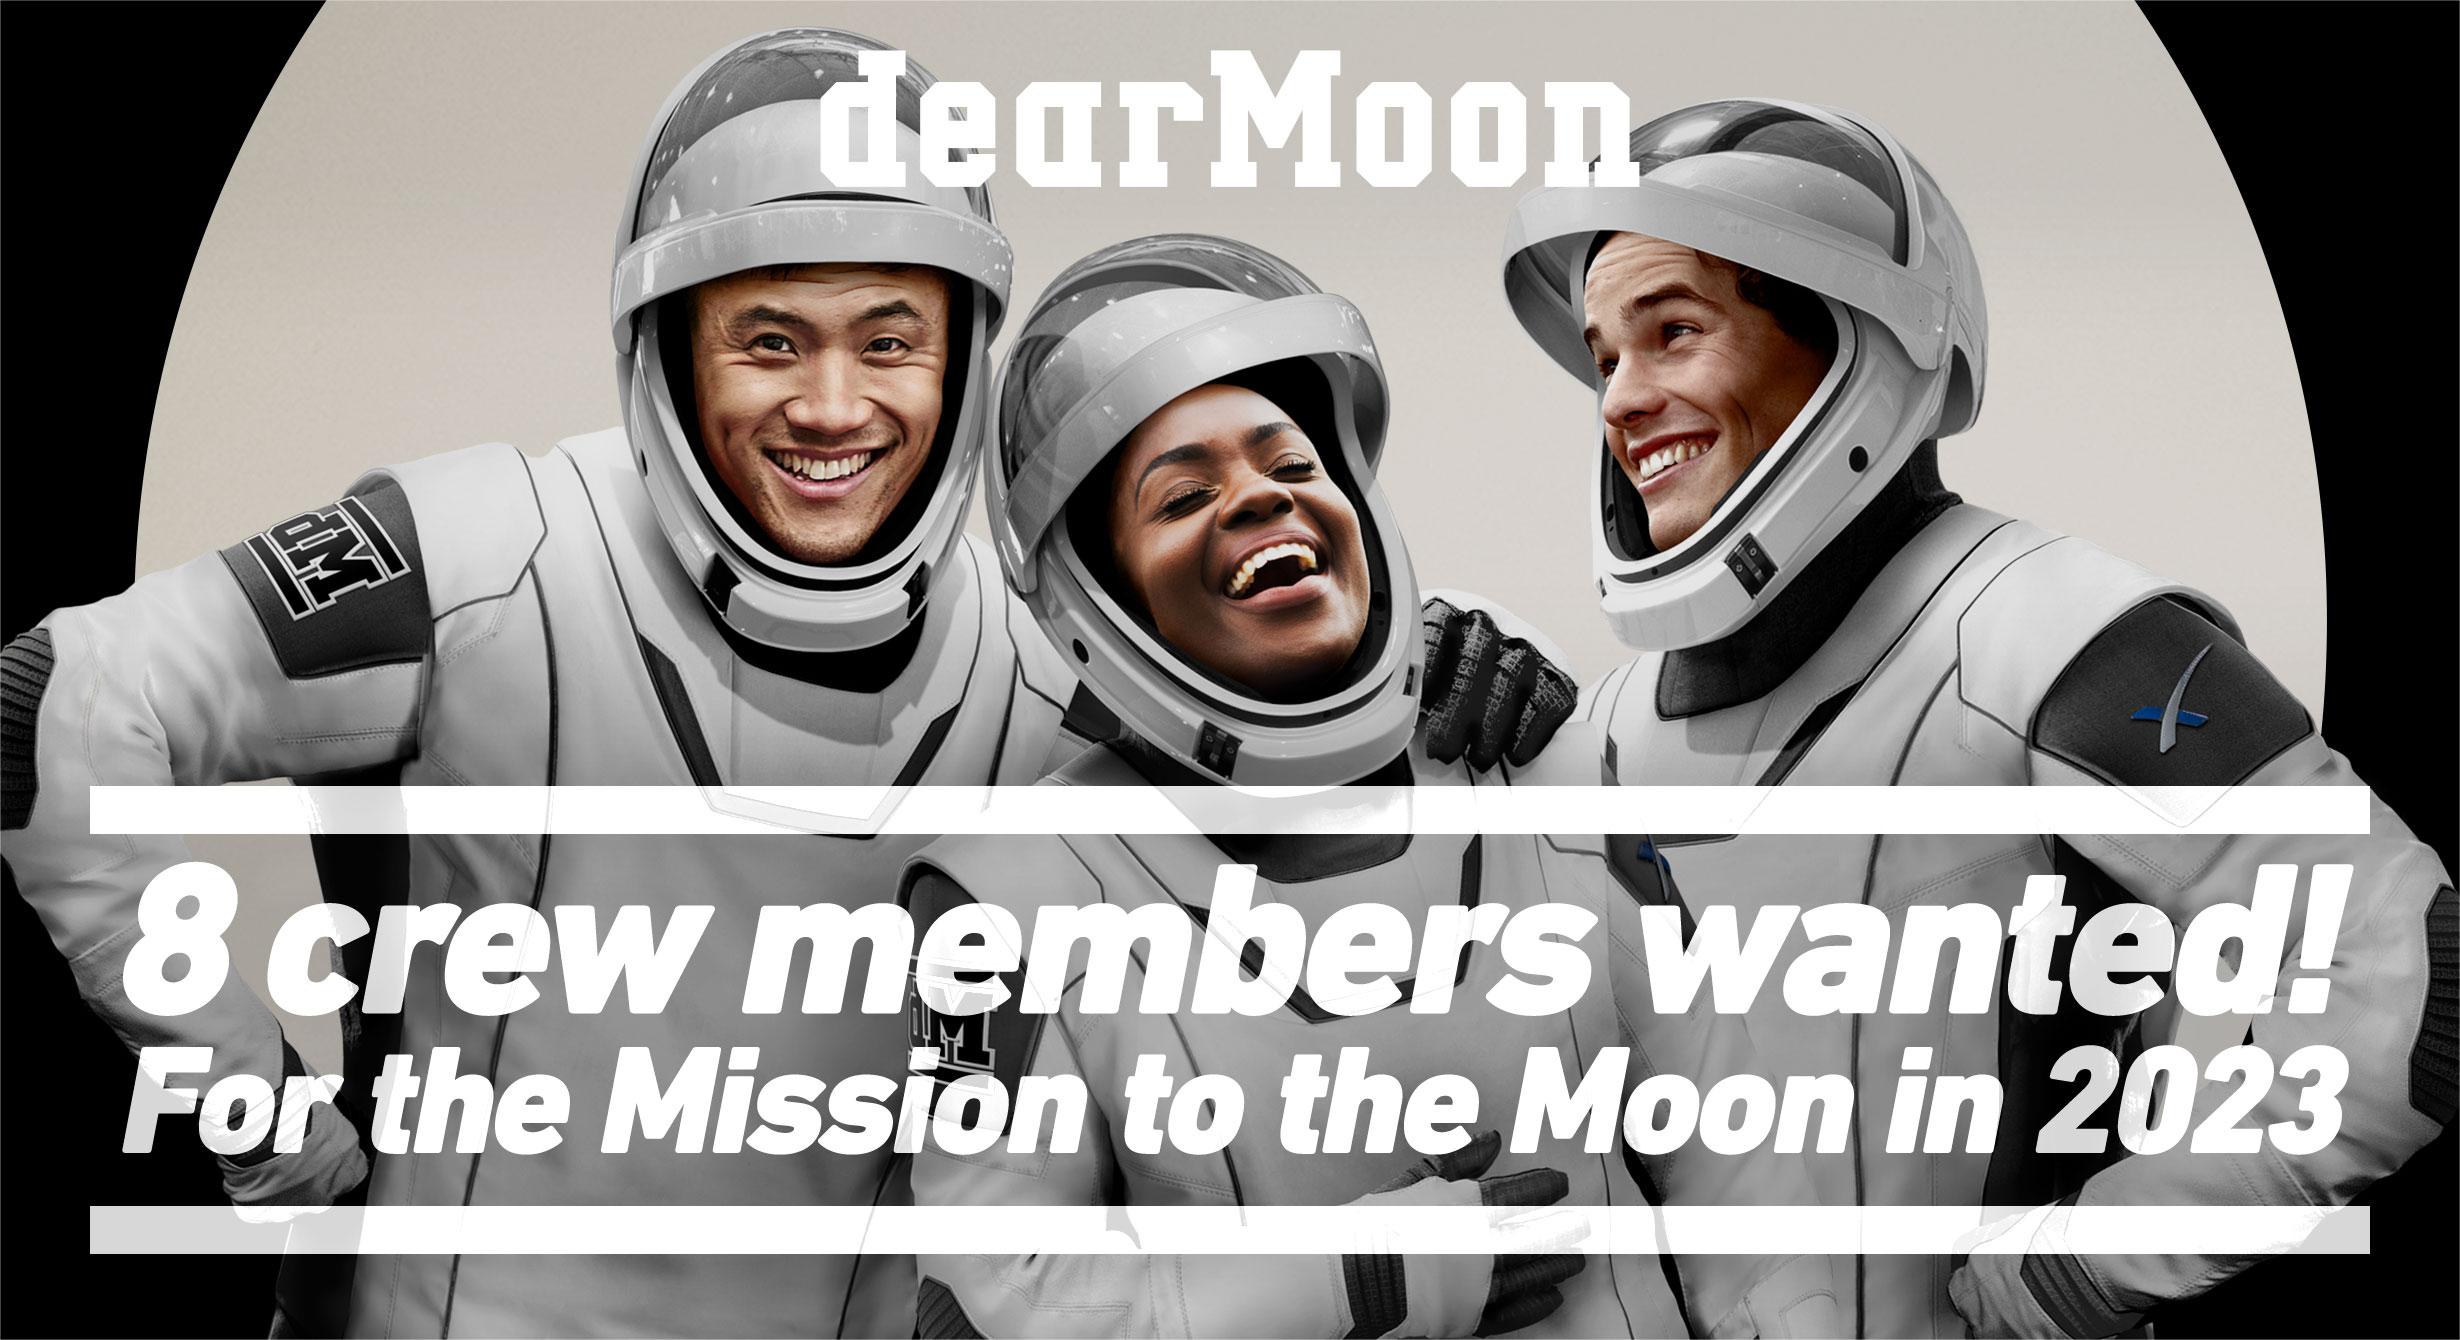 DearMoon: Ιάπωνας επιχειρηματίας μας καλεί σε ταξίδι στο φεγγάρι